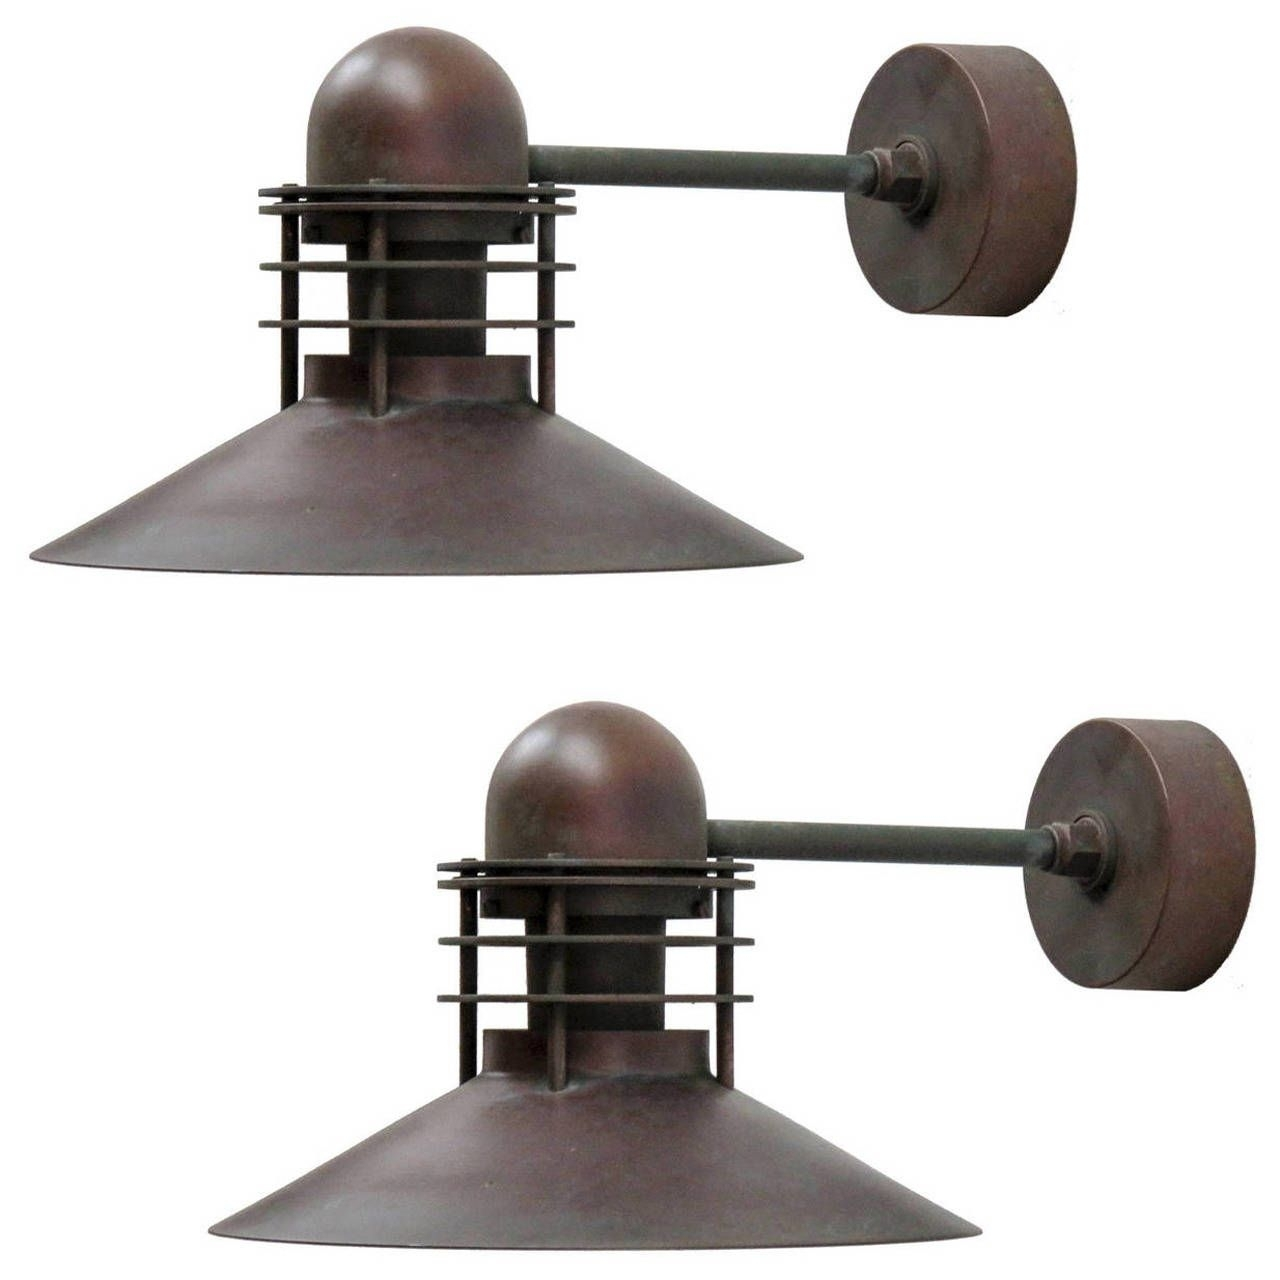 Louis Poulsen Copper Outdoor Lamps   Modern Wall, Lights And Modern Inside Beach Outdoor Wall Lighting (#9 of 15)